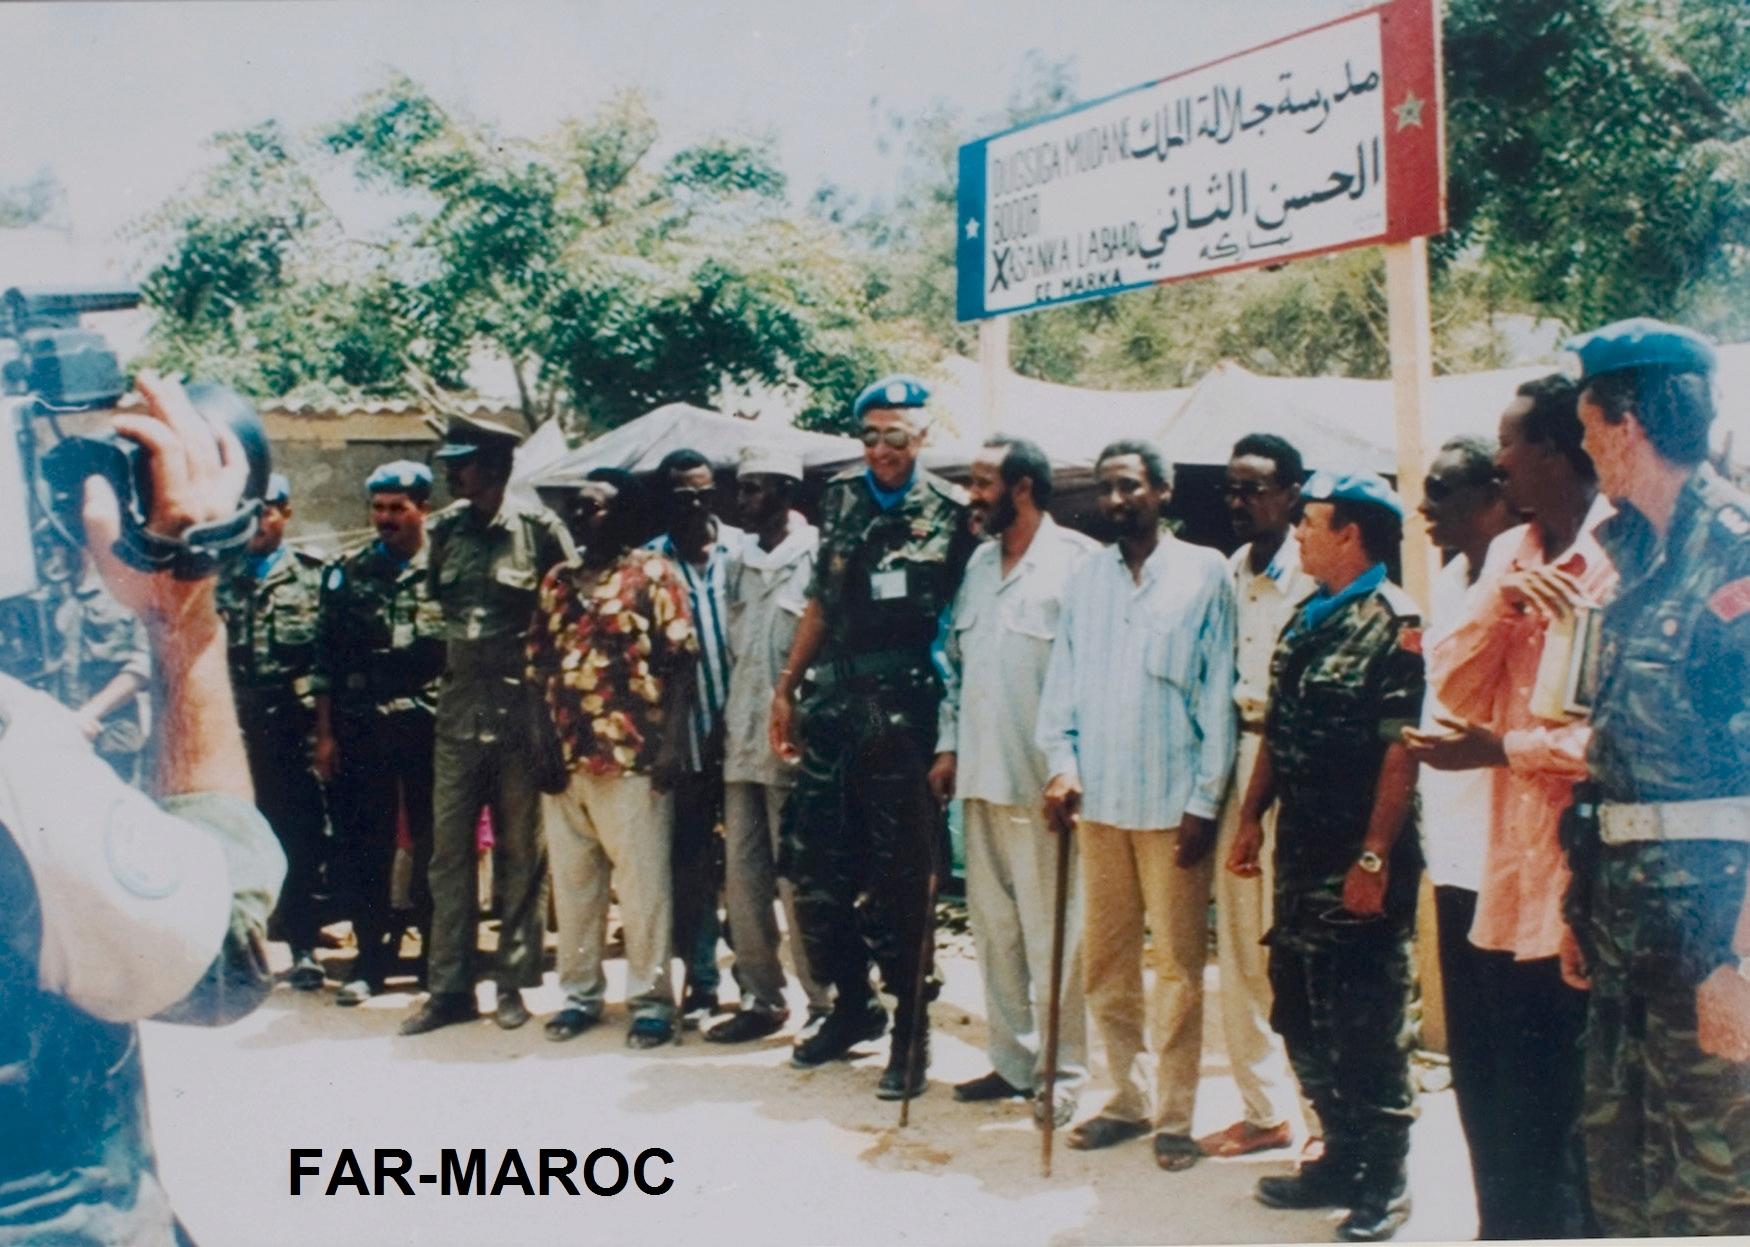 Les FAR en Somalie - Page 2 Clipb186